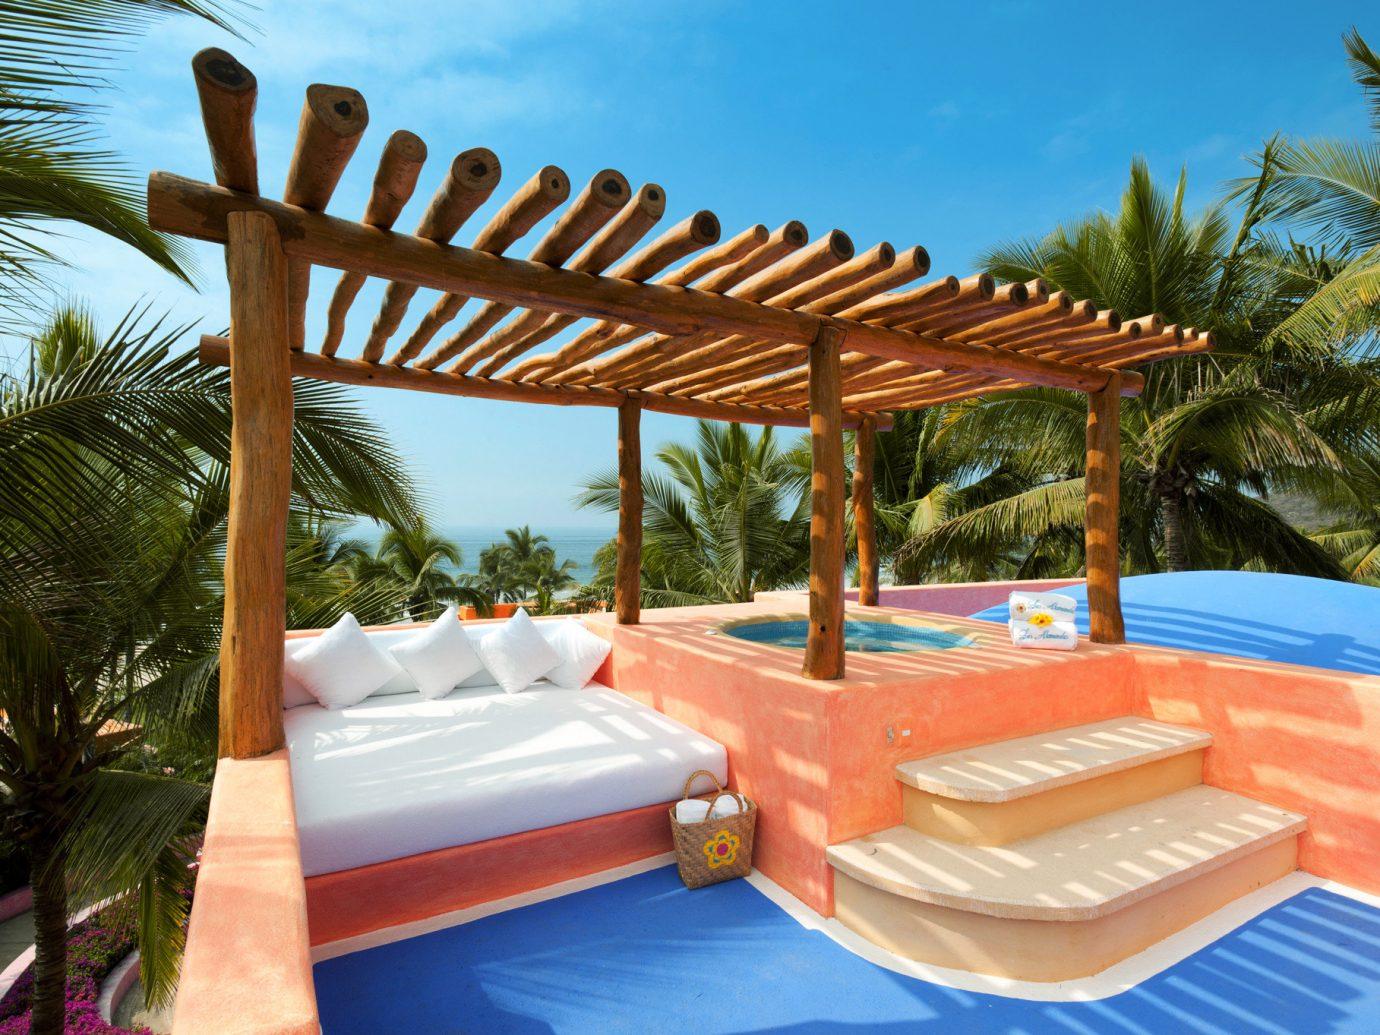 Beachfront Hot tub Hot tub/Jacuzzi Hotels Luxury Romance tree outdoor swimming pool property leisure Resort Villa vacation estate eco hotel outdoor structure hacienda caribbean